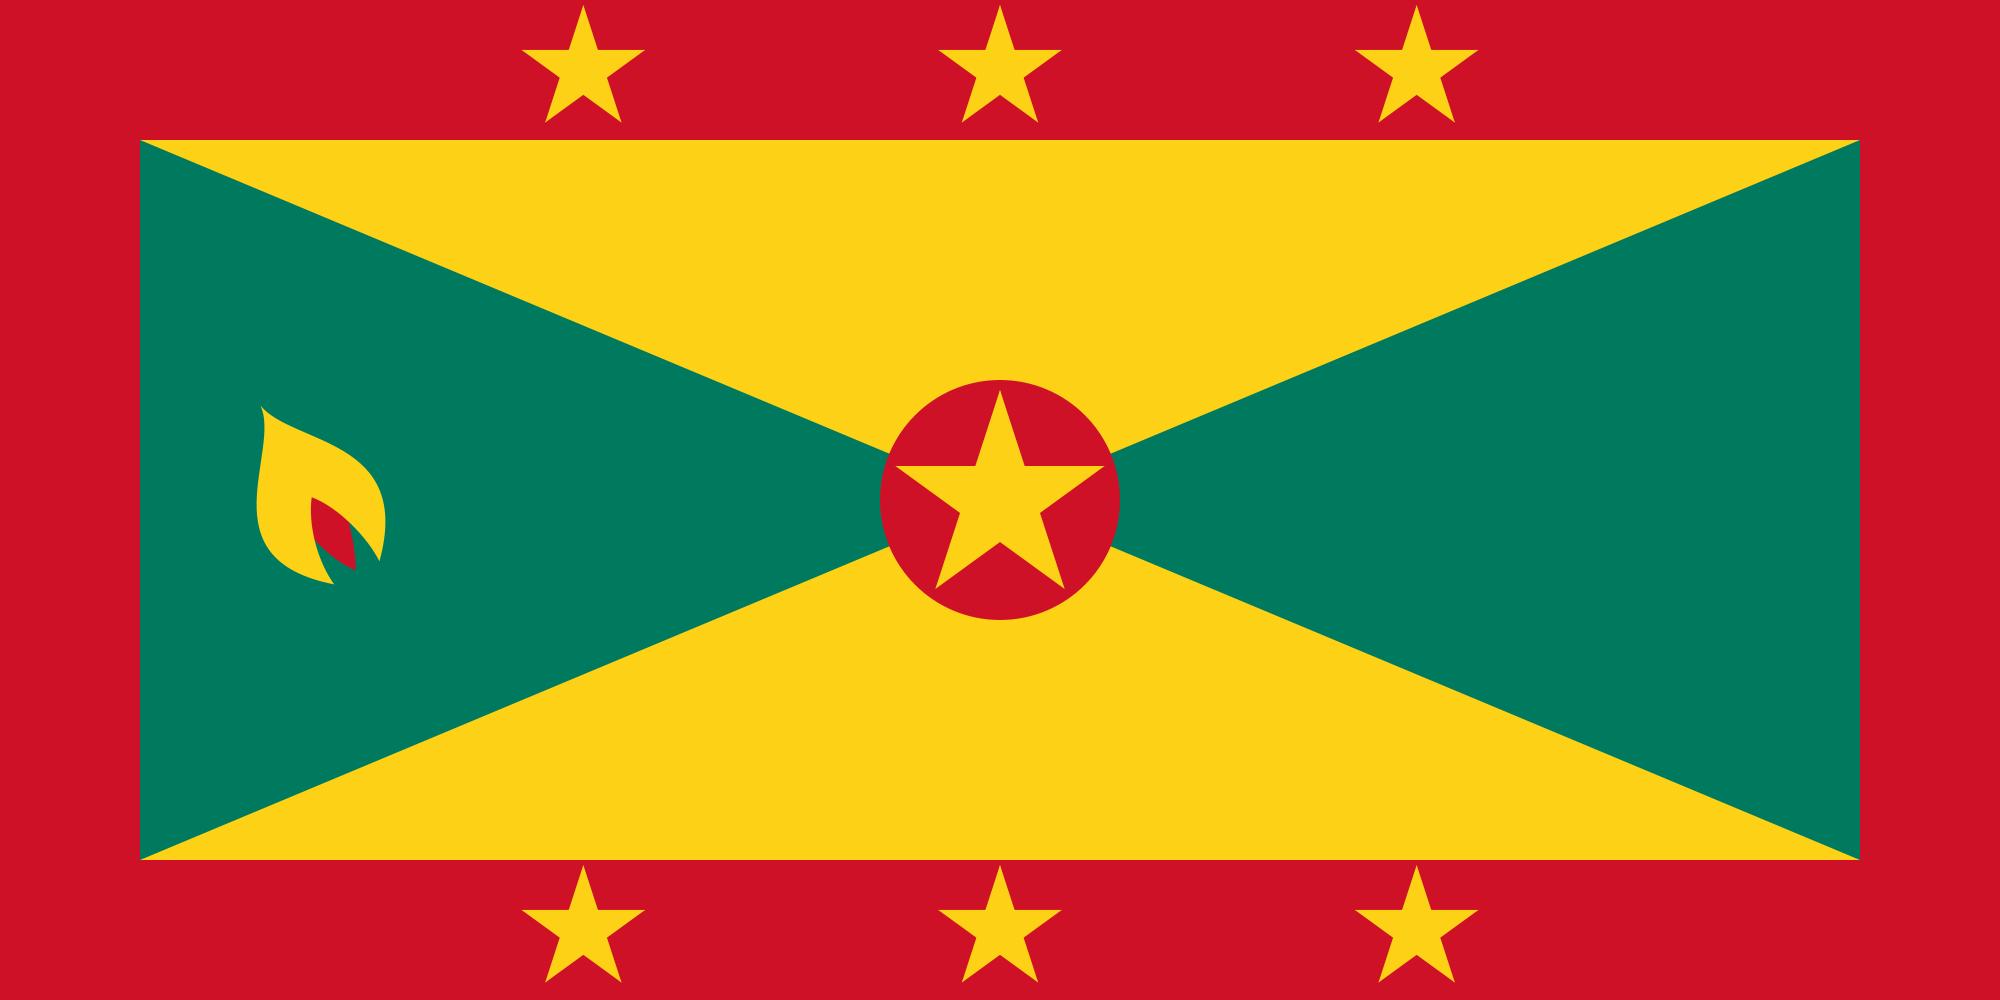 Grenada (Civil ensign)